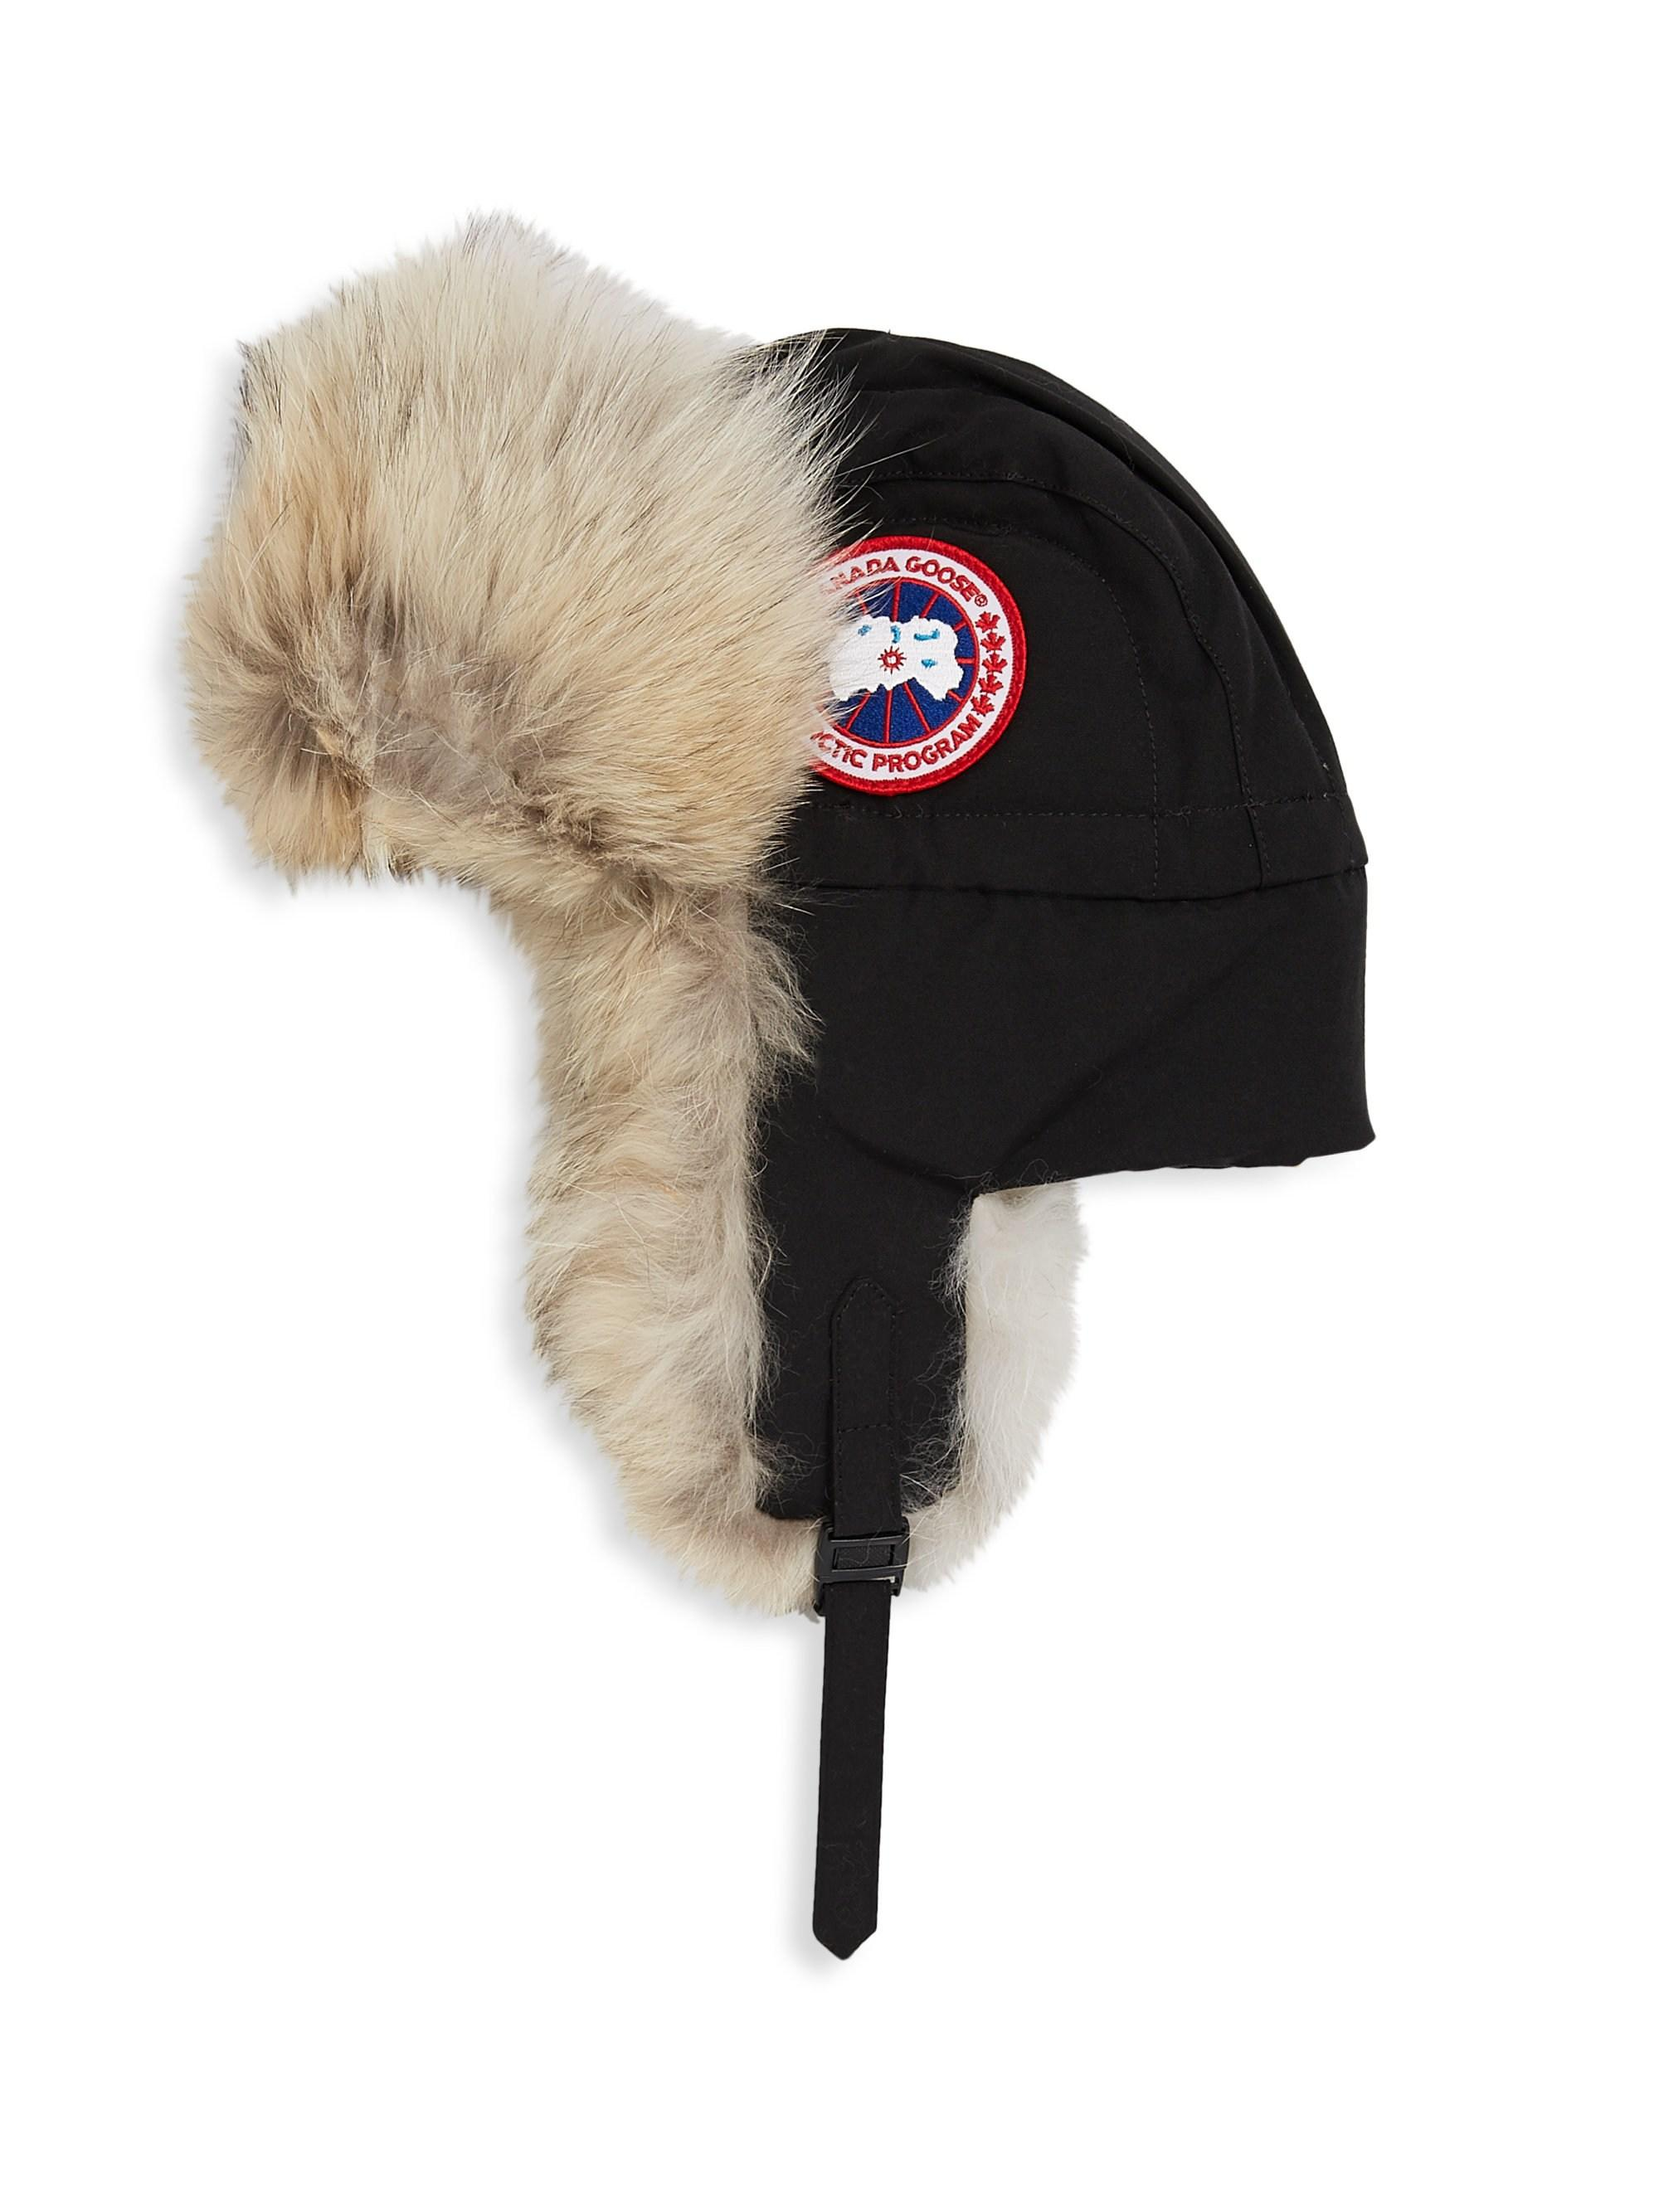 75a8c871c32 Canada Goose Aviator Fur Hat in Black for Men - Lyst